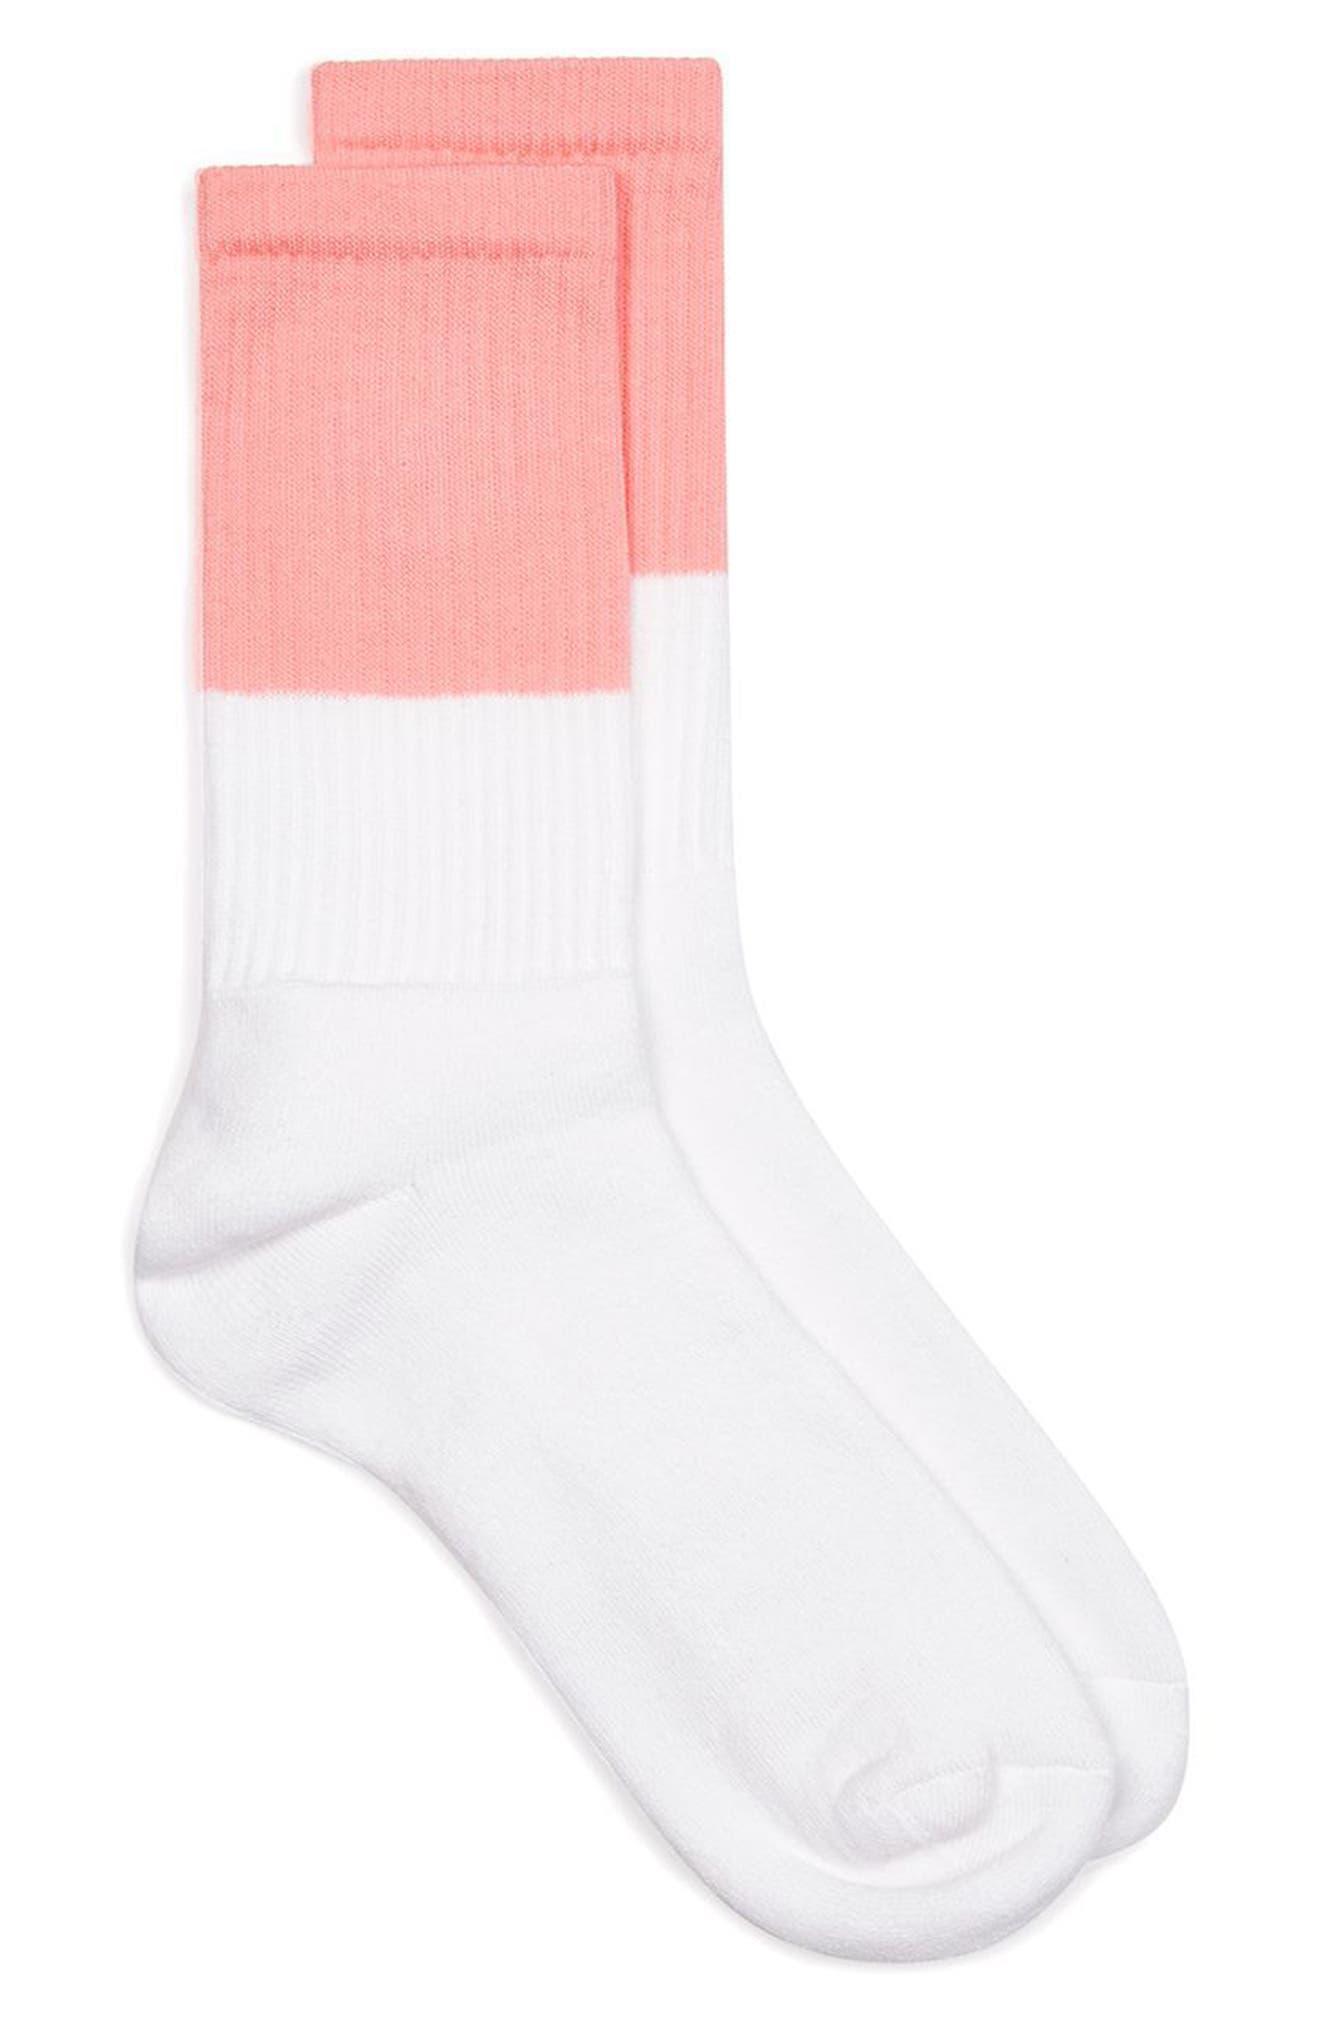 Alternate Image 1 Selected - Topman Colorblock Tube Socks